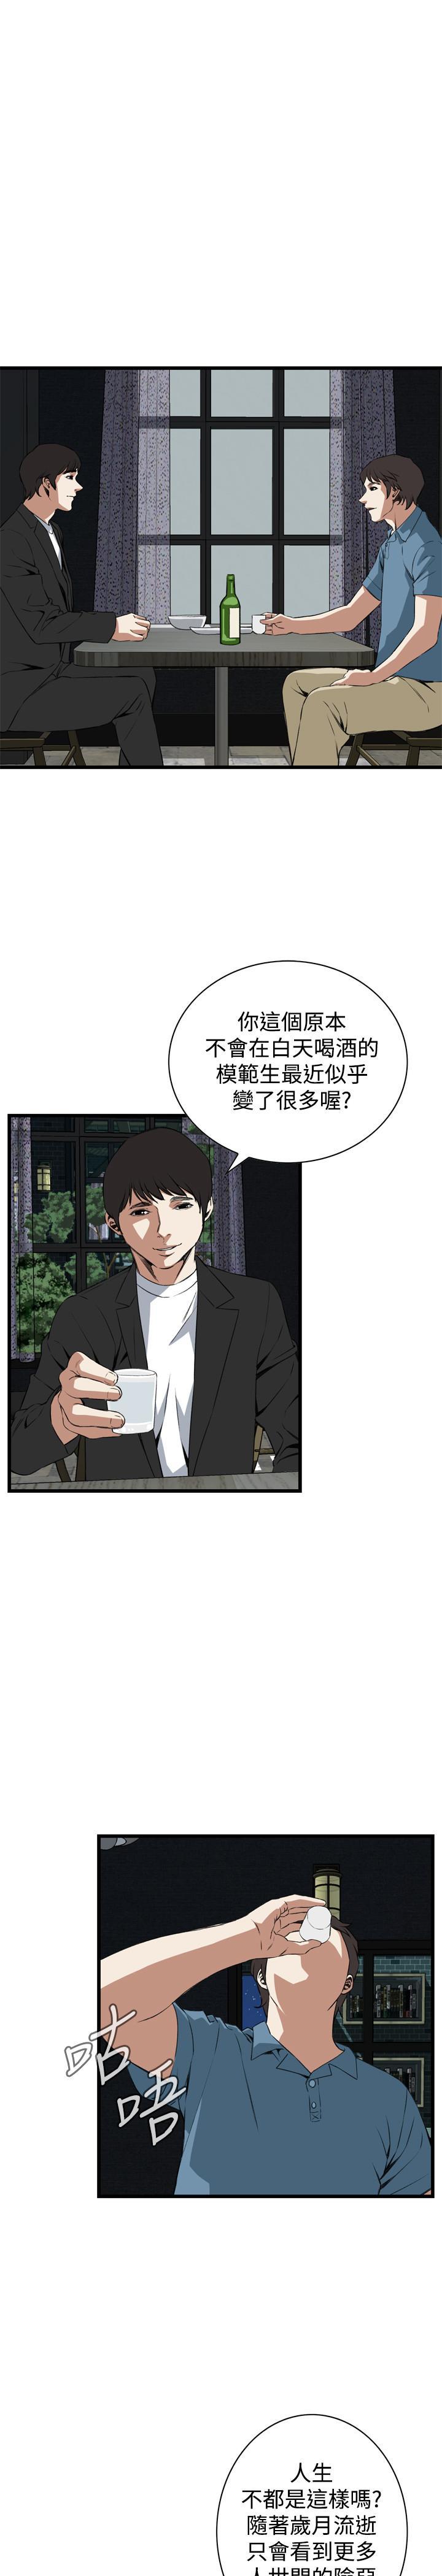 Take a Peek 偷窥 Ch.39~60 [Chinese]中文 633